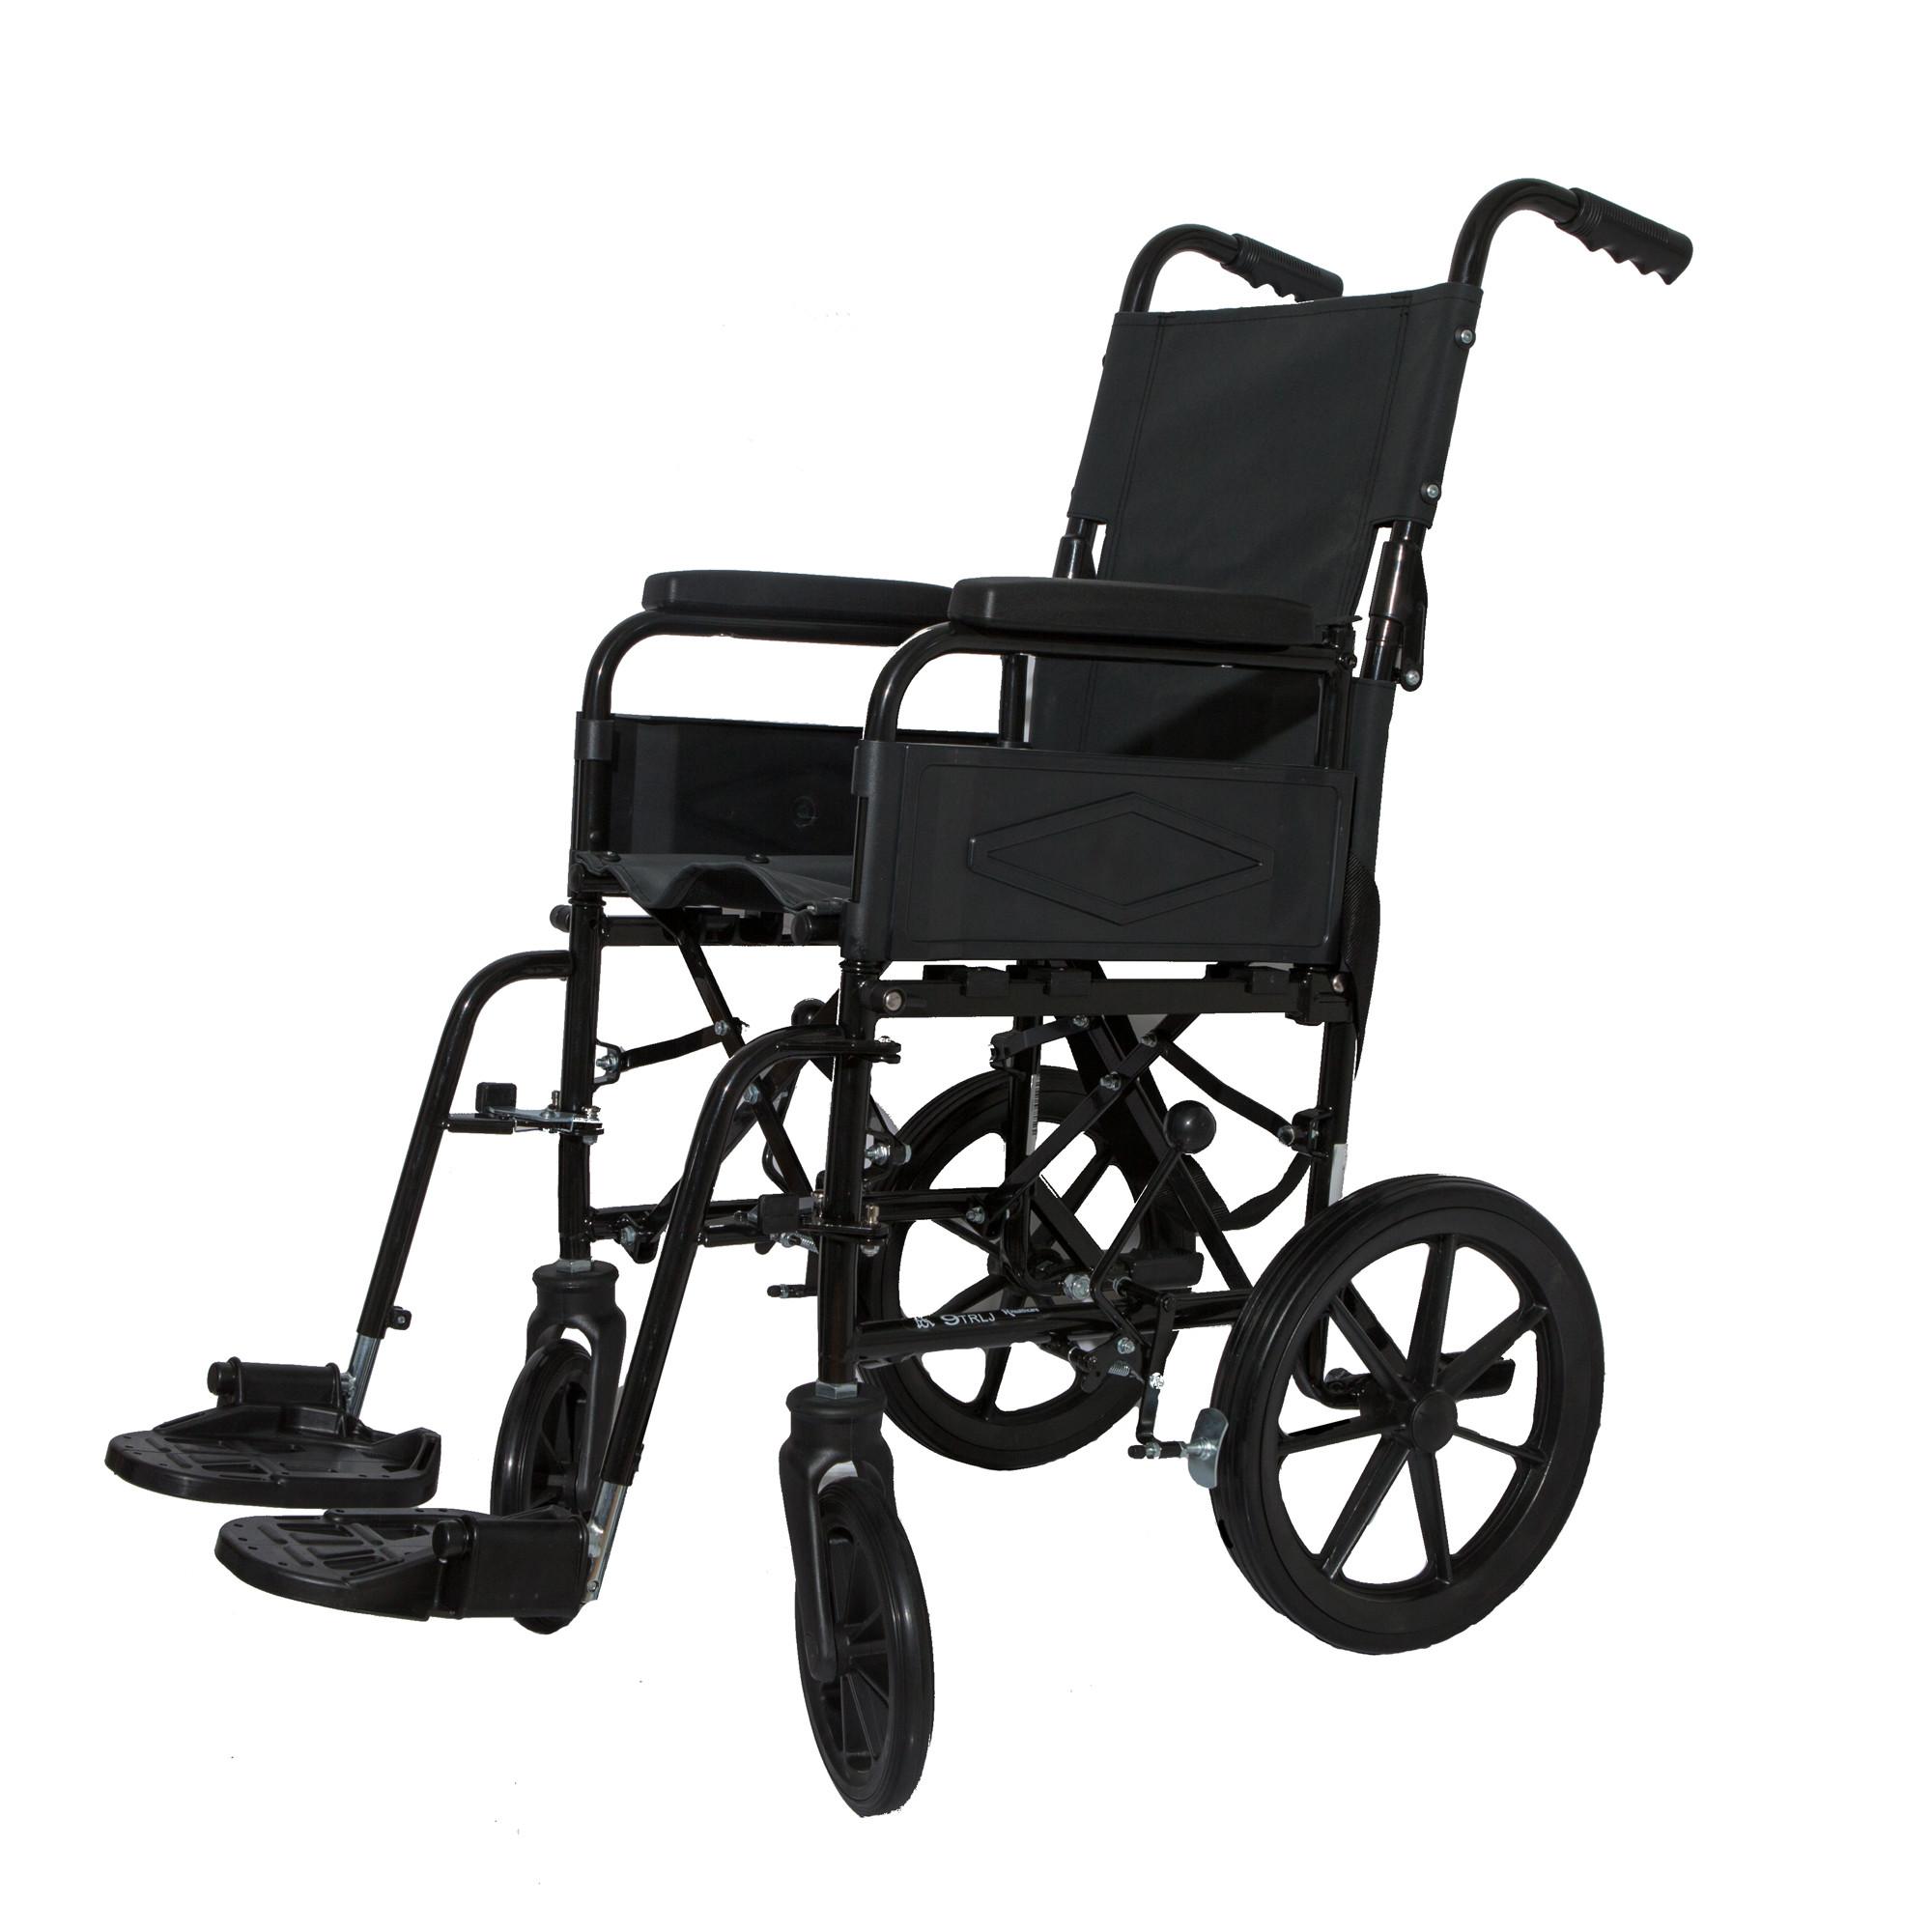 9trl Child Attendant Propelled Wheelchair 1